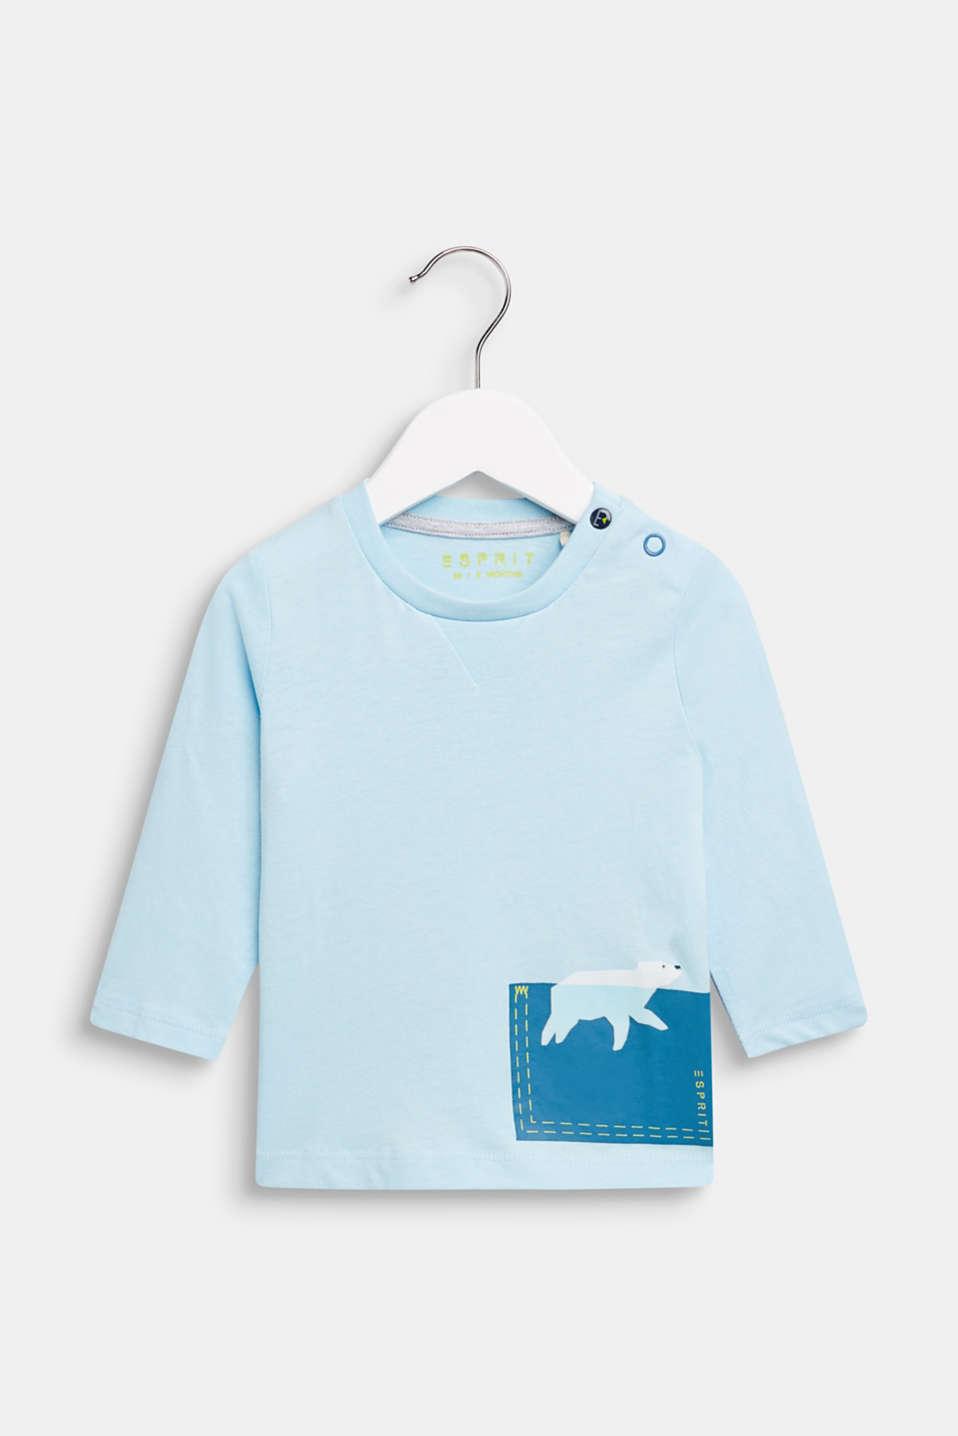 Esprit Longsleeve mit Eisbär Print, 100% Baumwolle im